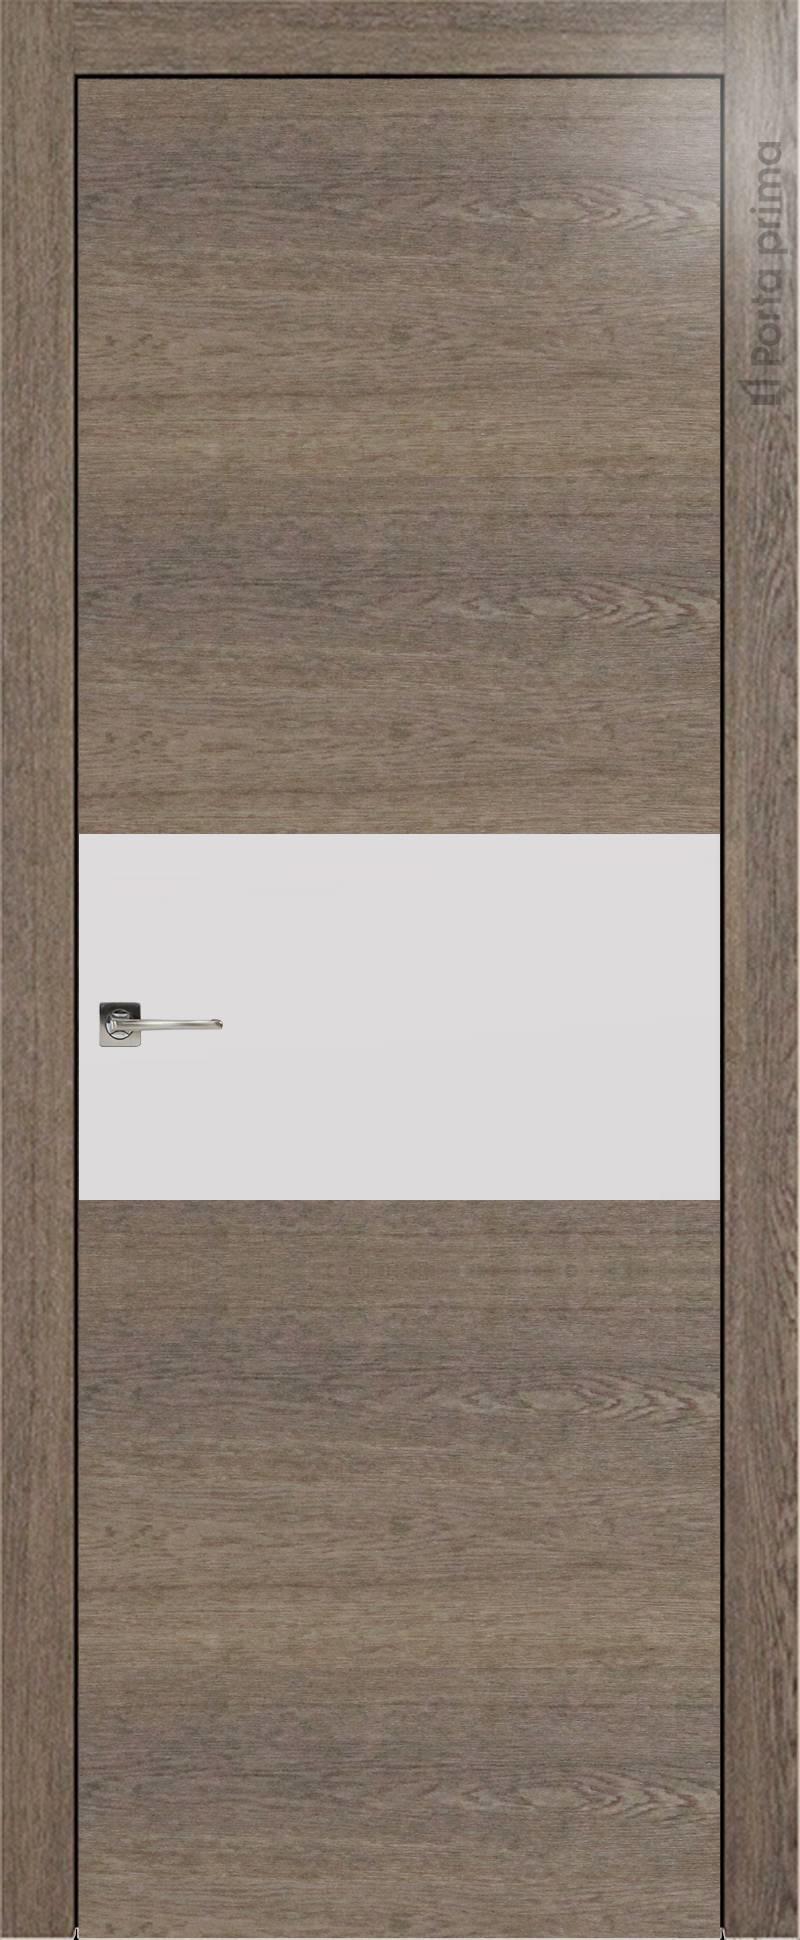 Tivoli Е-4 цвет - Дуб антик Без стекла (ДГ)